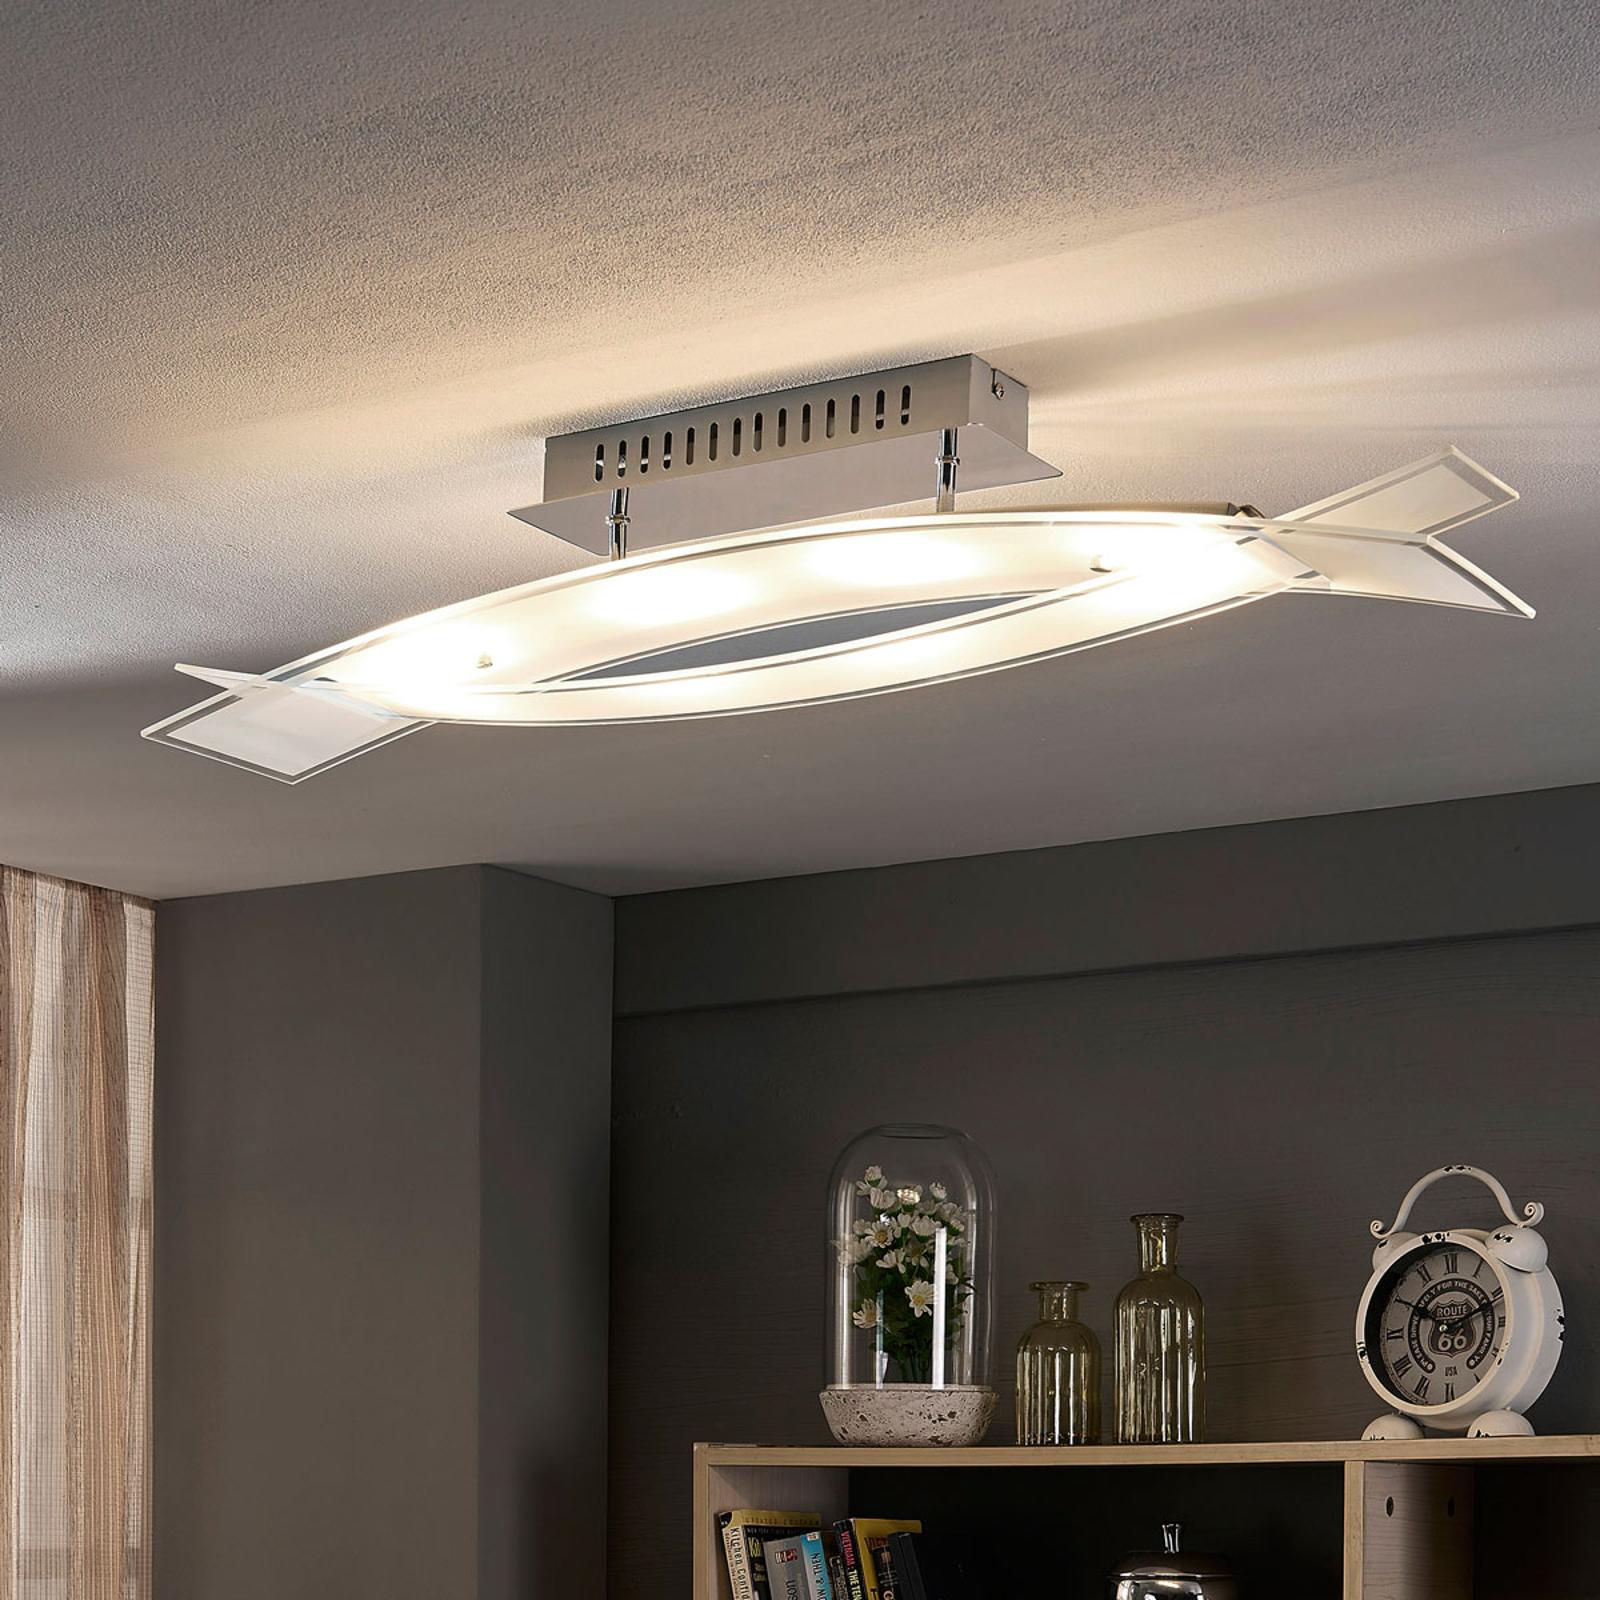 Lampa sufitowa LED Fiete ze szkła